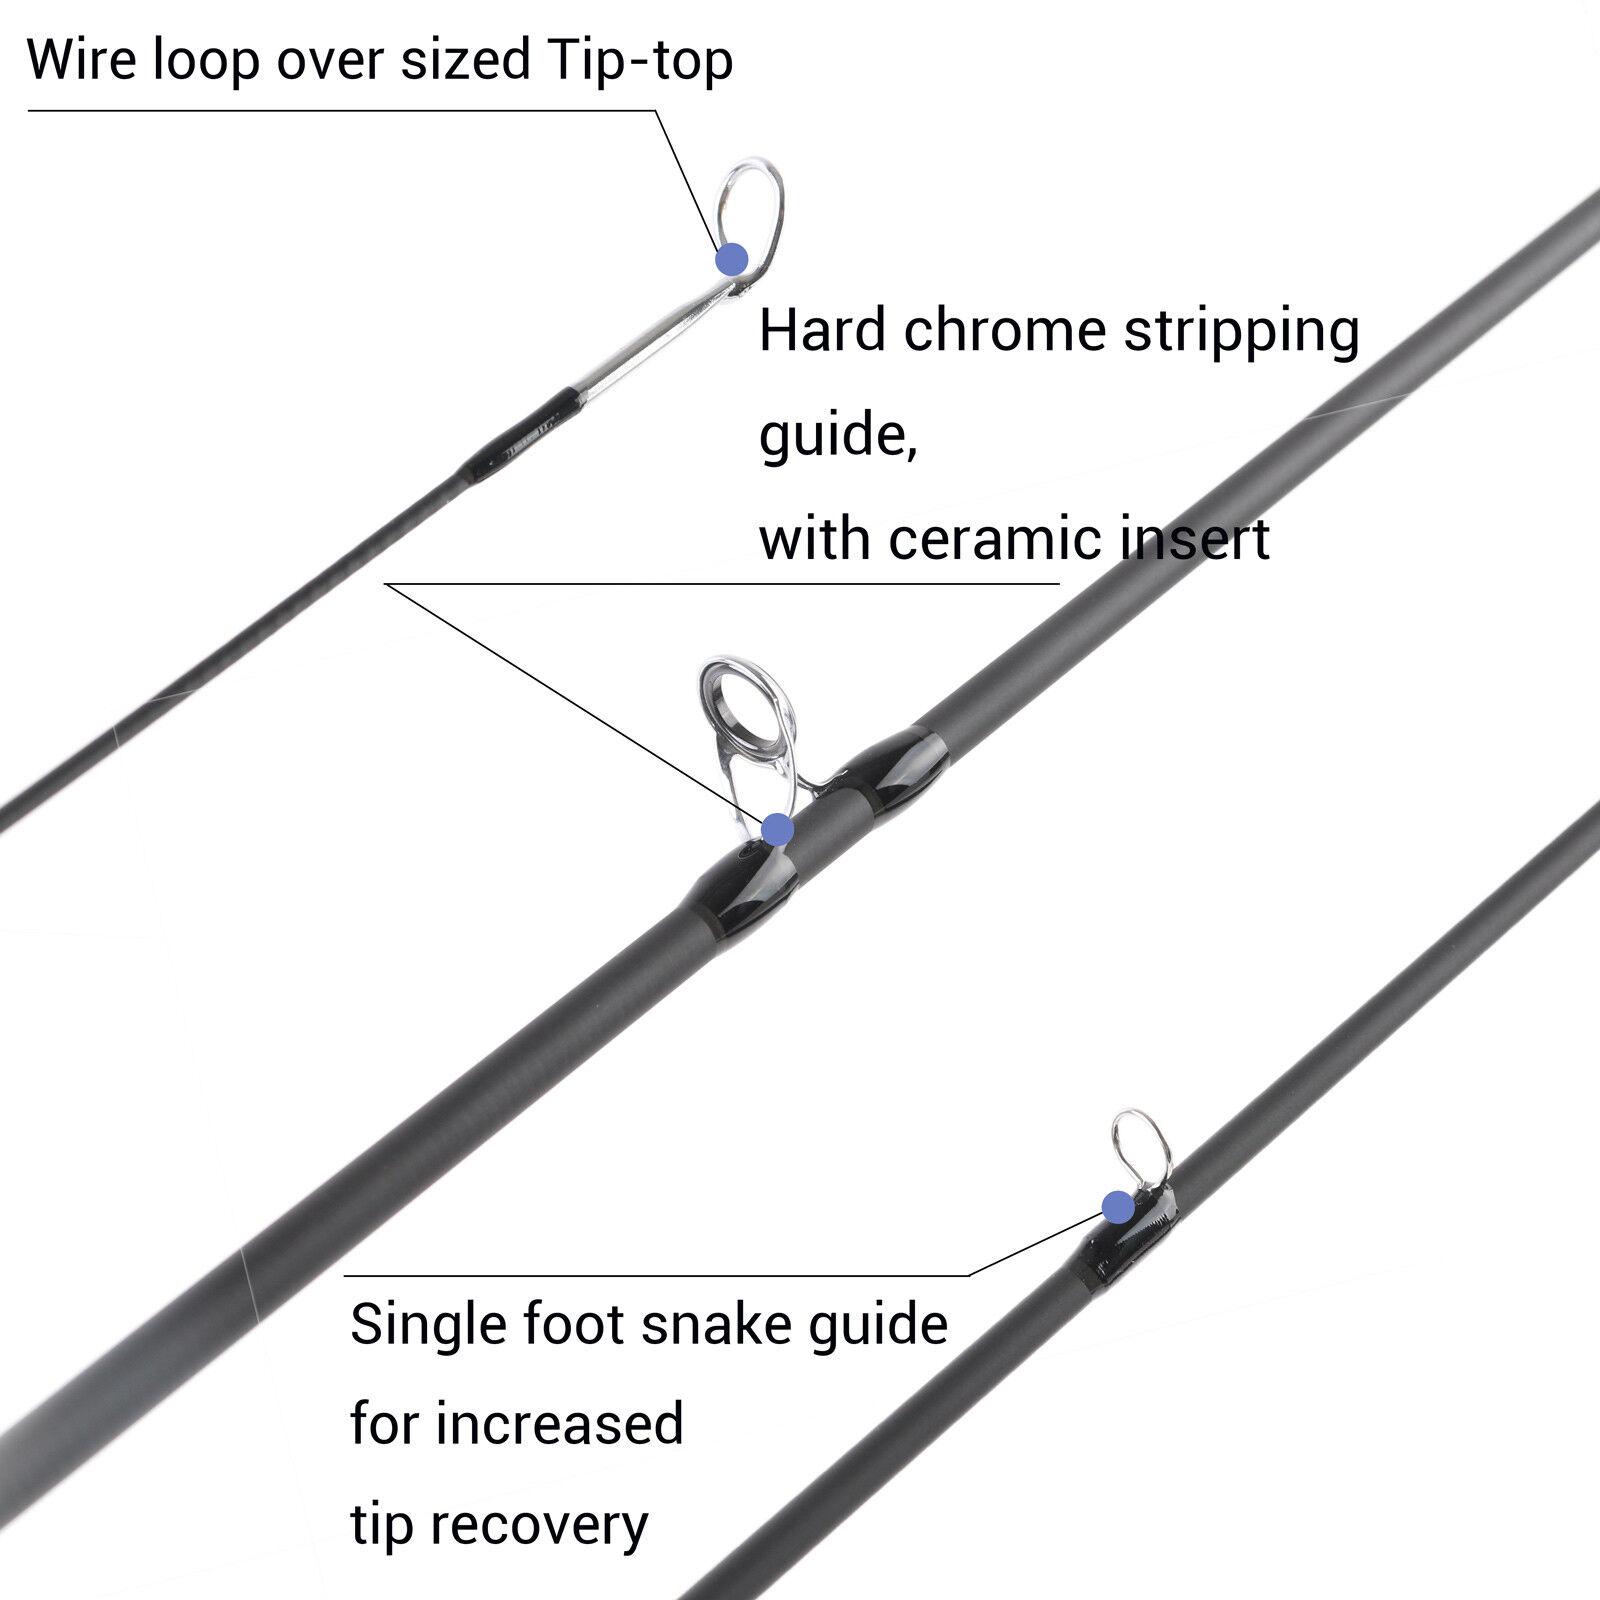 2WT 7'6'' 4Pcs Fly Fishing Fishing Fishing Rods Light Weight  Medium-Fast Graphite Fly Rod Tube fdba7a